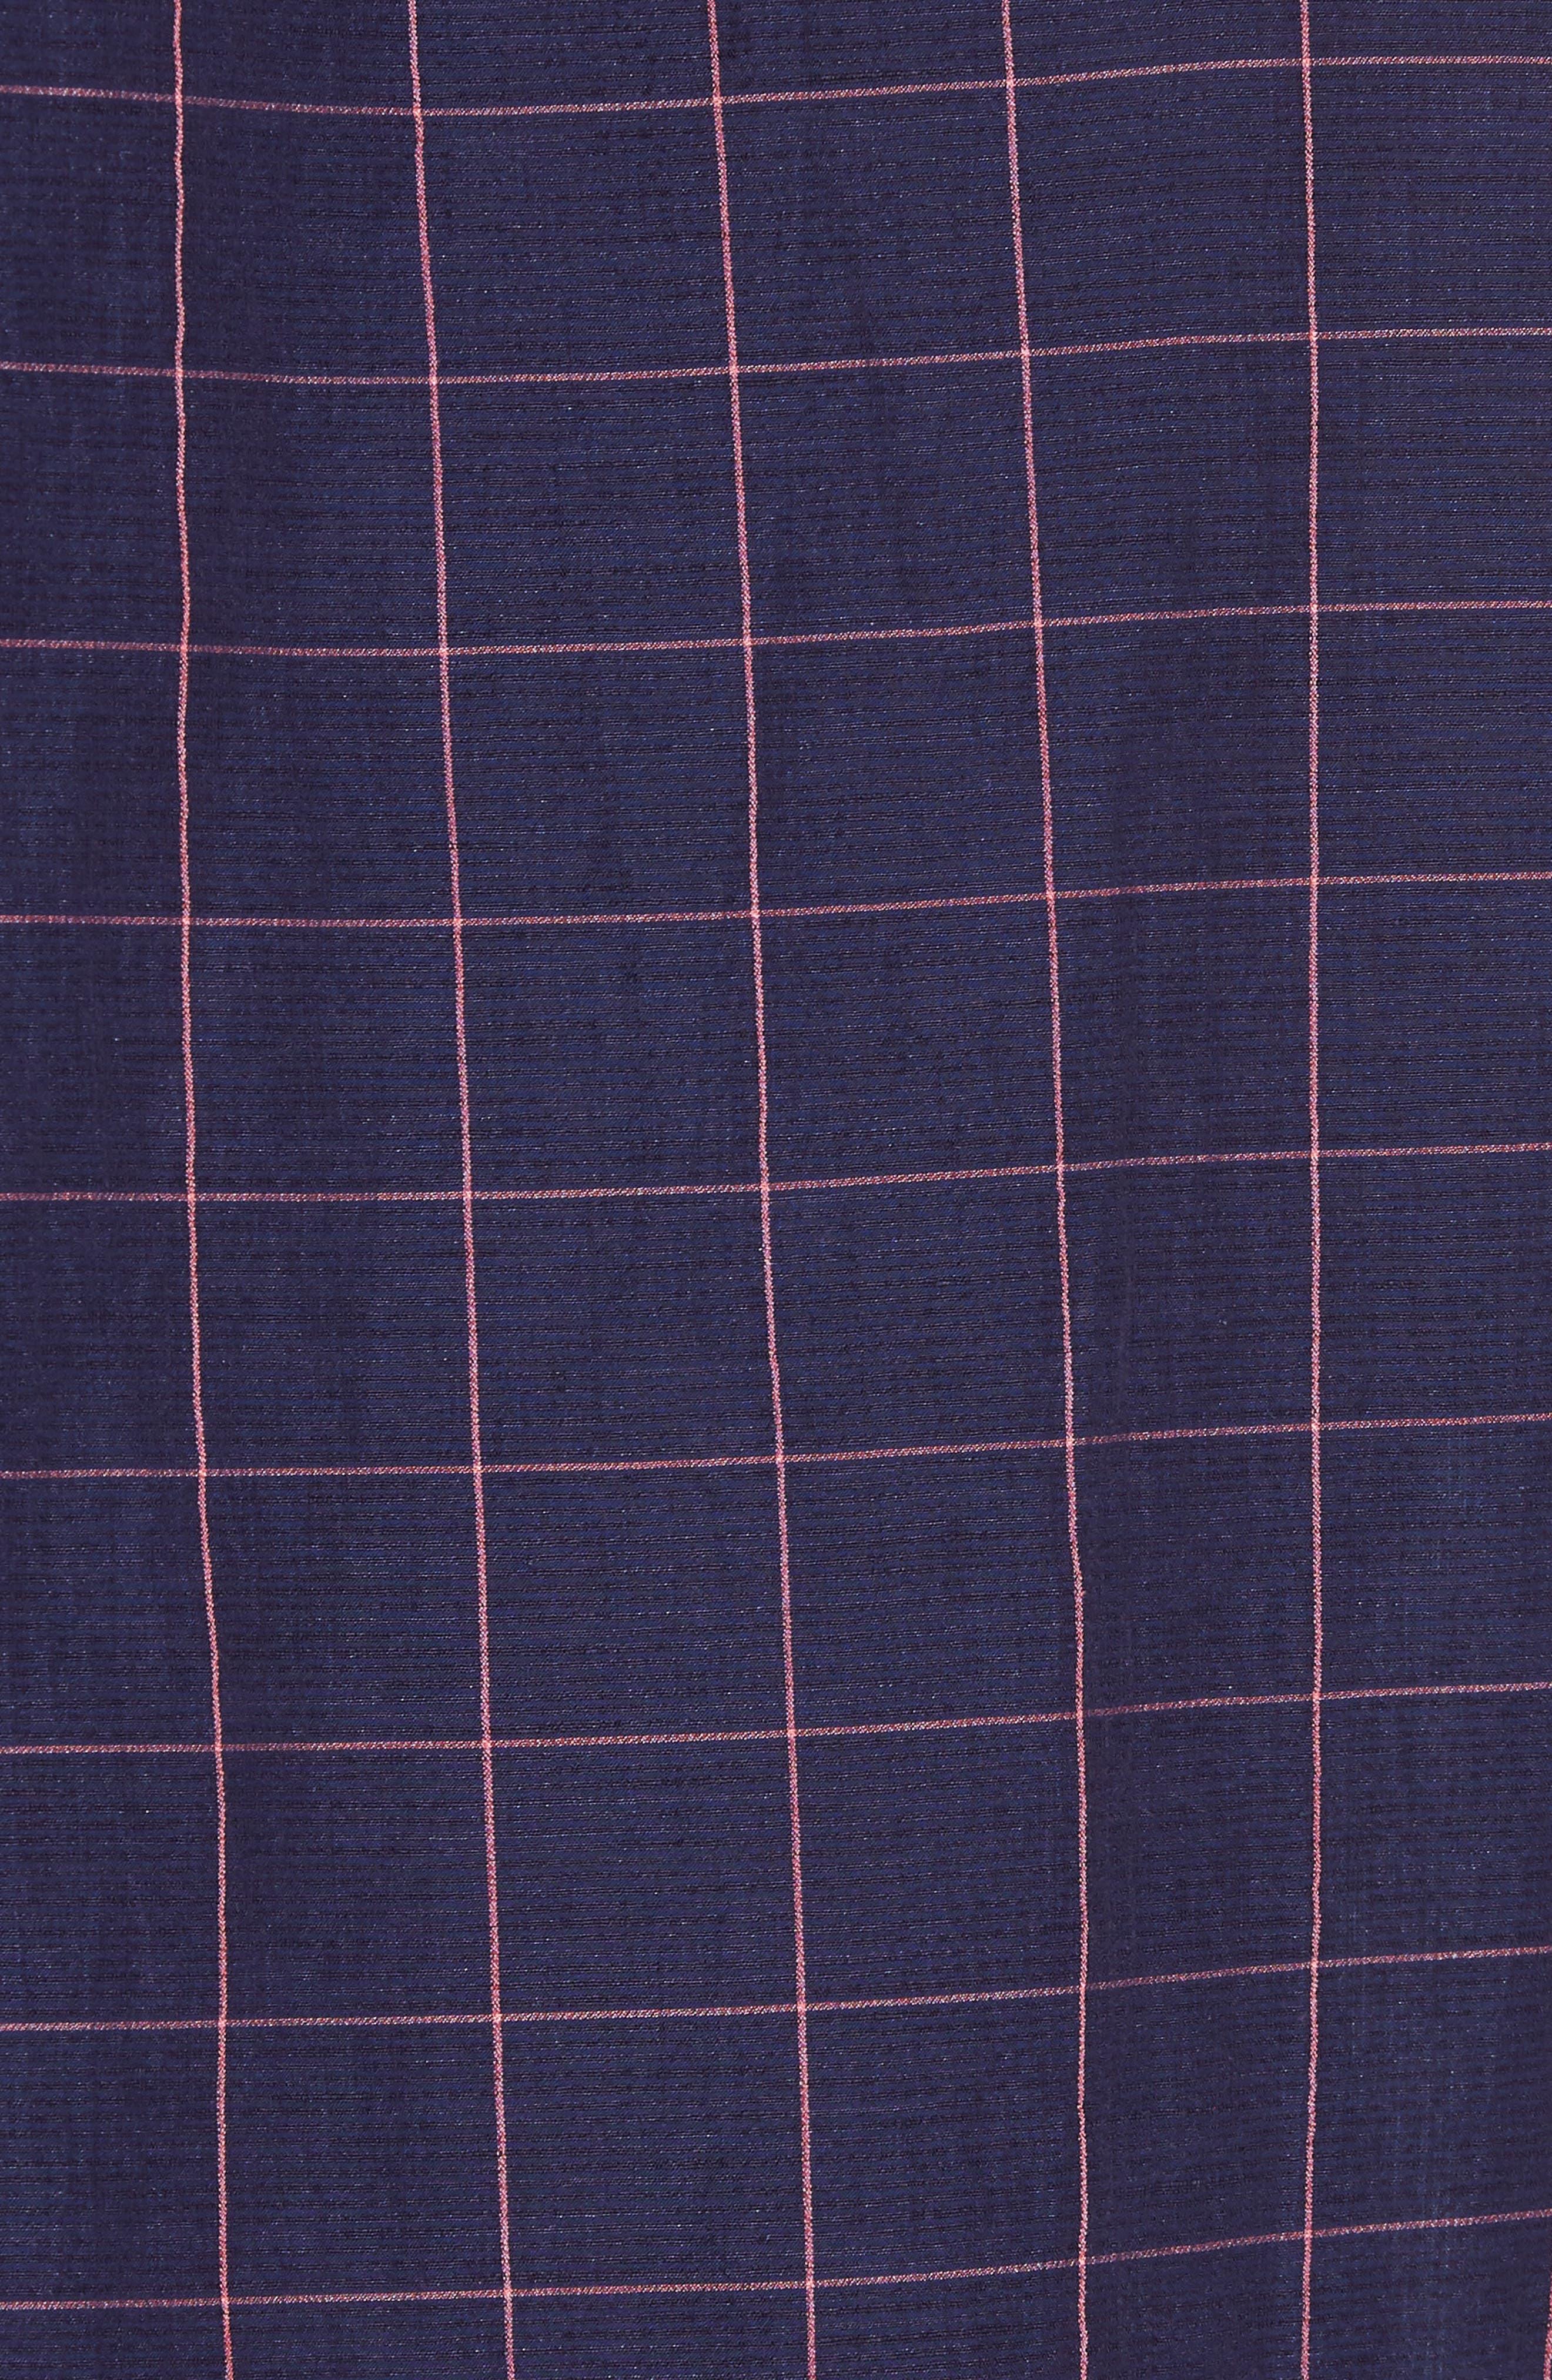 Tullarmore Windowpane Sport Shirt,                             Alternate thumbnail 5, color,